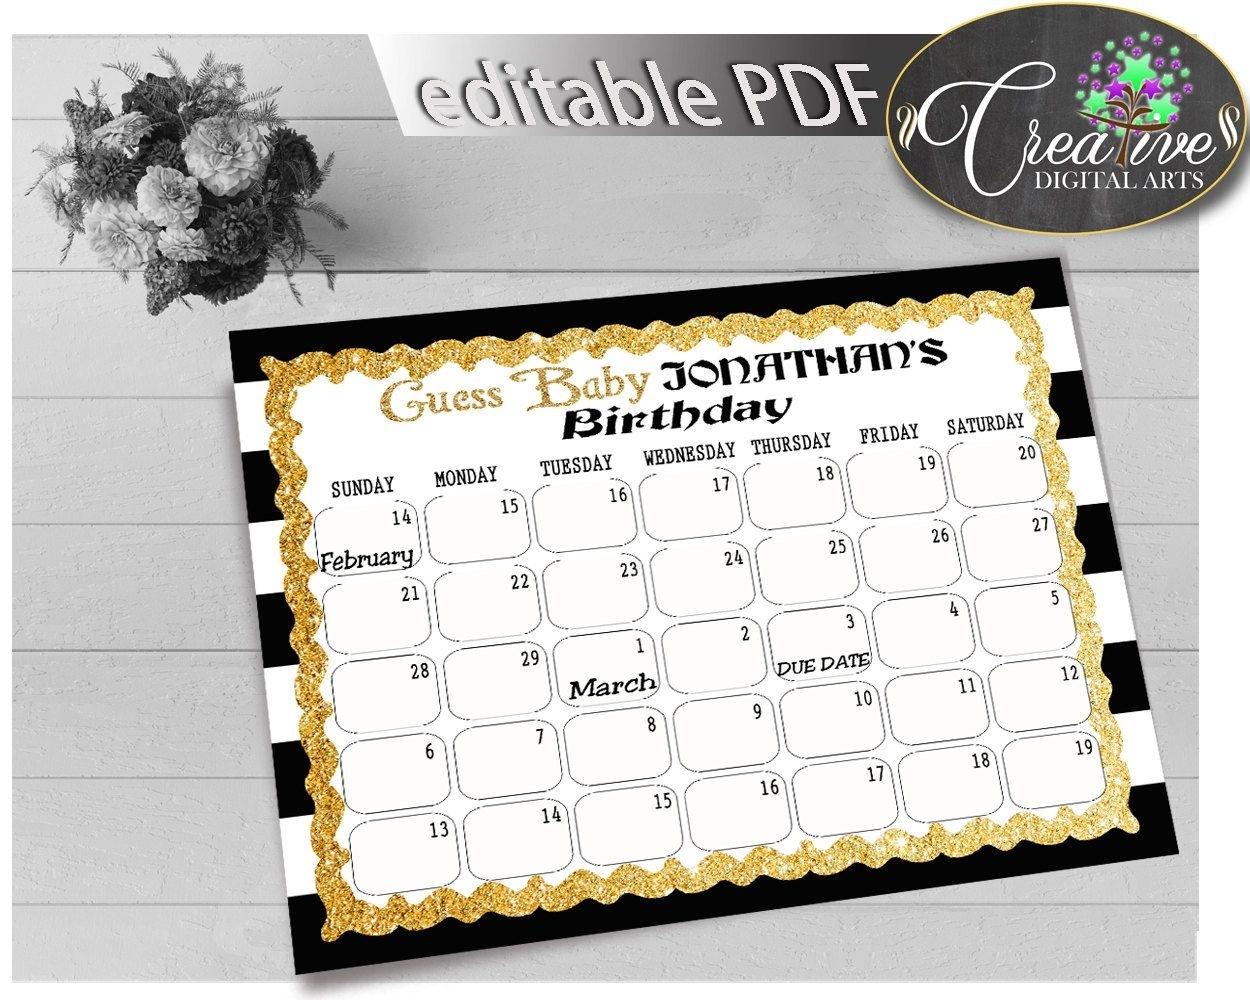 Due Date Guess February Calendar   Calendar Template 2021